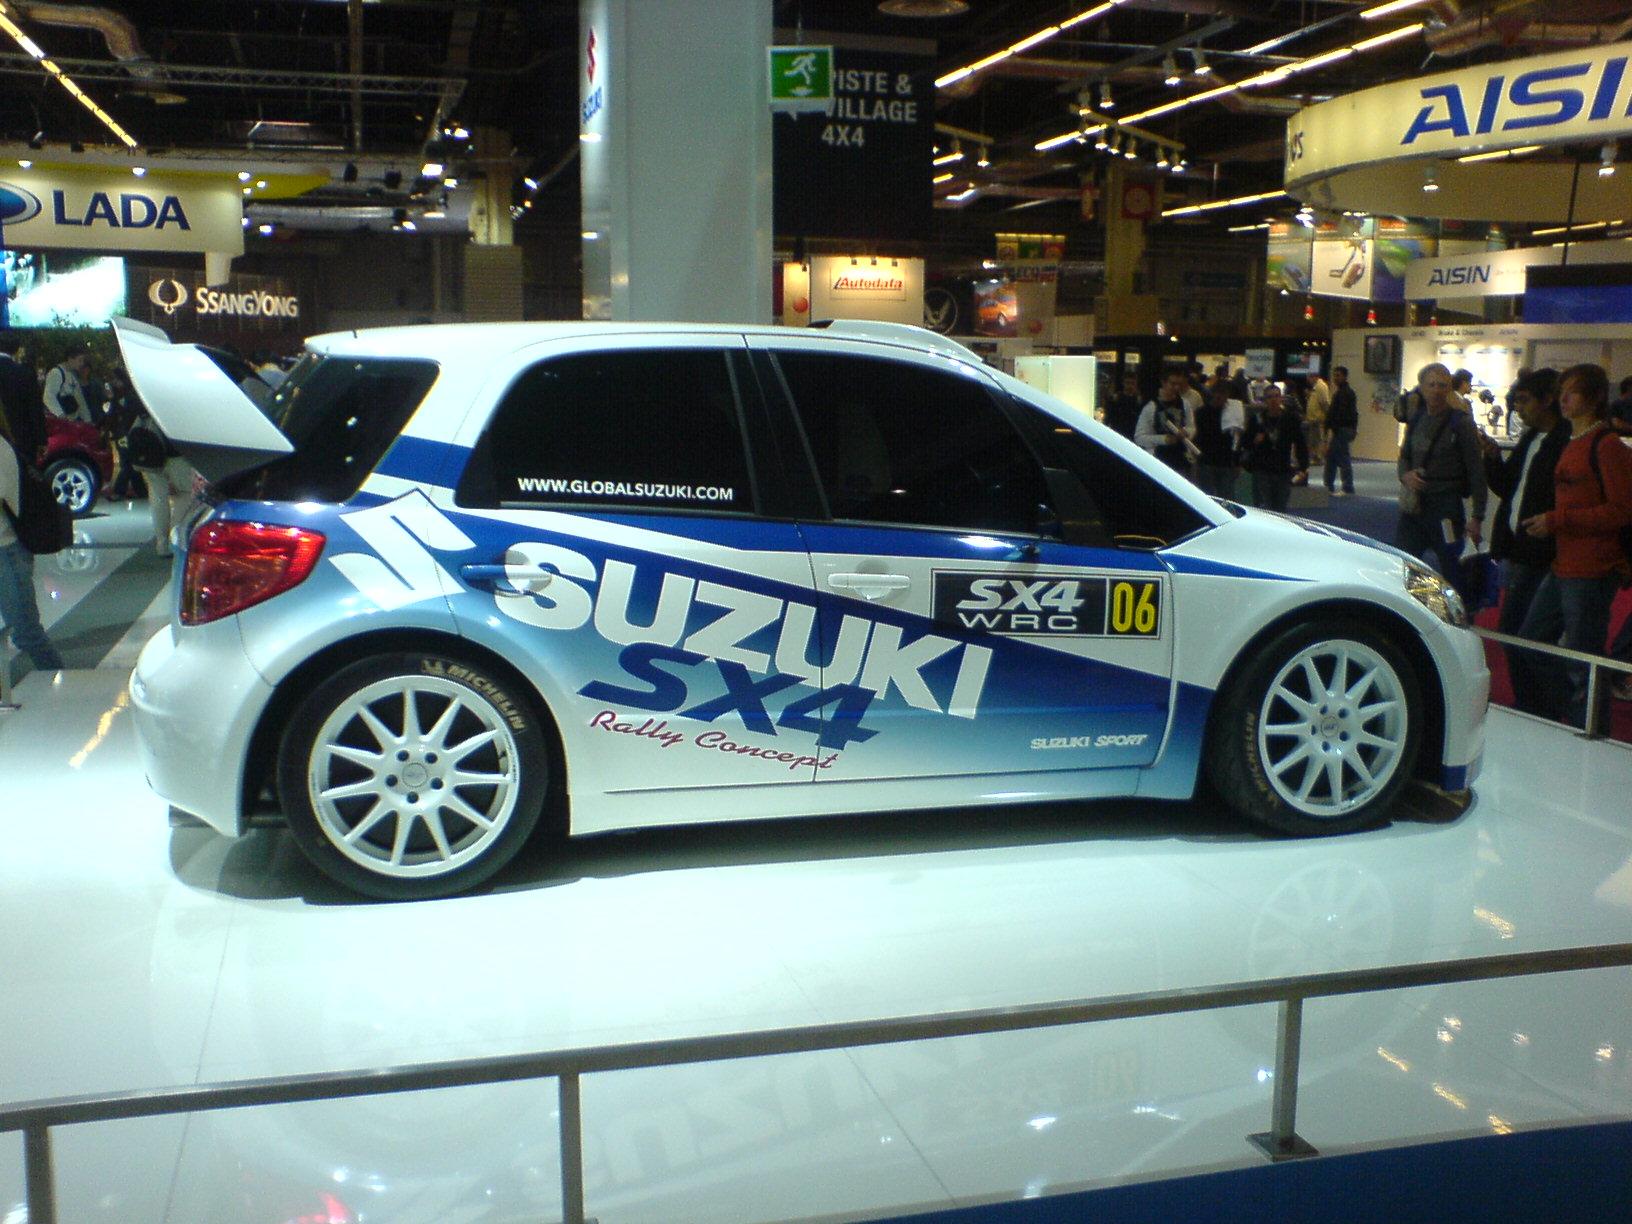 white cars suzuki sx4 white cars suzuki sx4 white cars